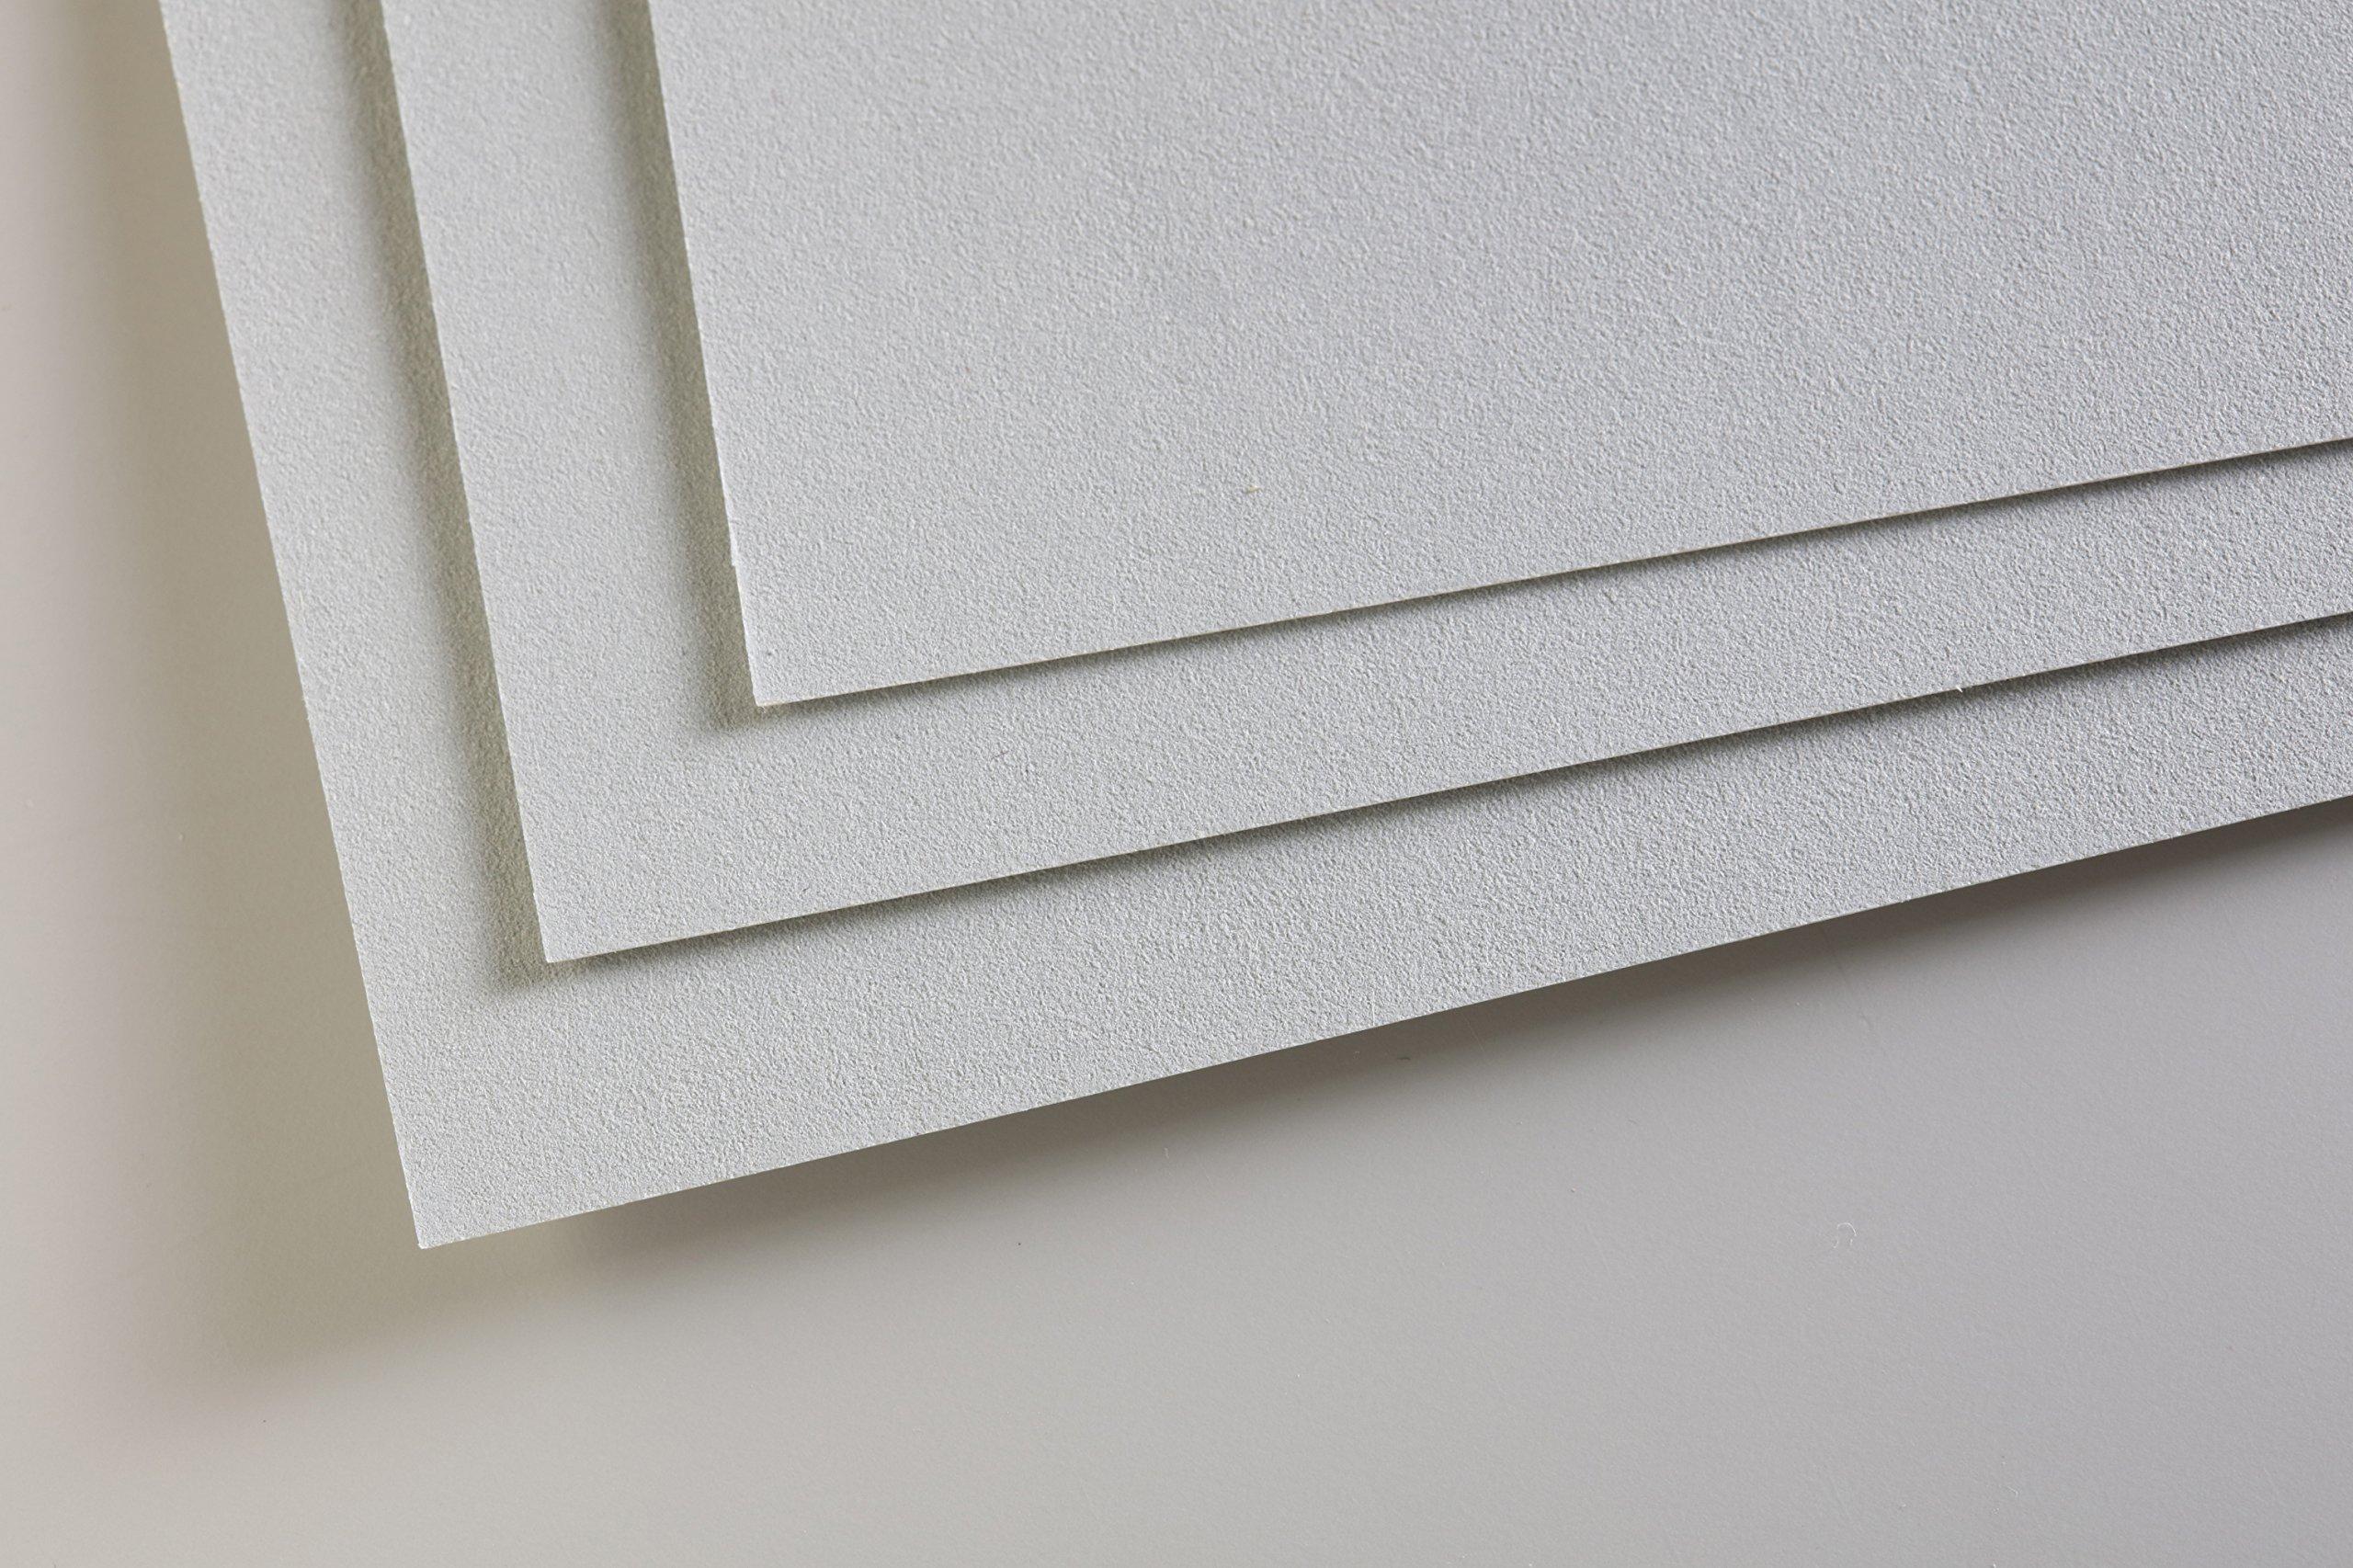 19-1//2 x 25-1//2 Inch Sheet Light Blue Pastelmat Card for Pastel